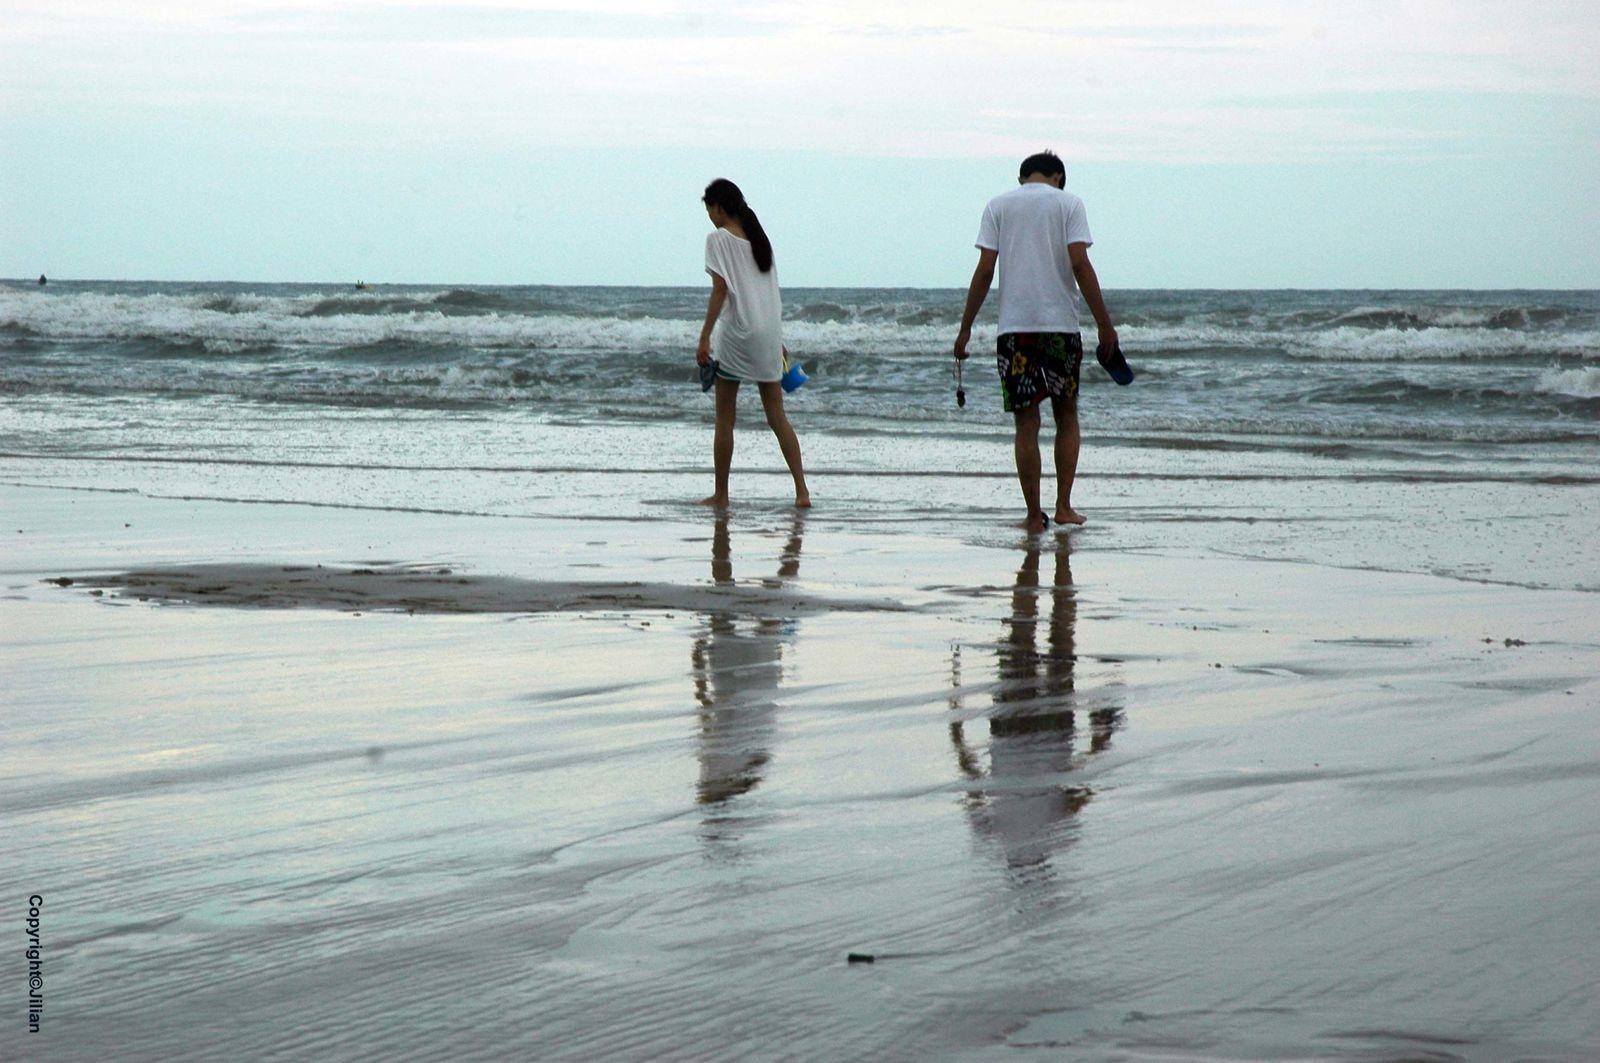 Paysages d'eau 2, Beihai - 水上风景-2,北海